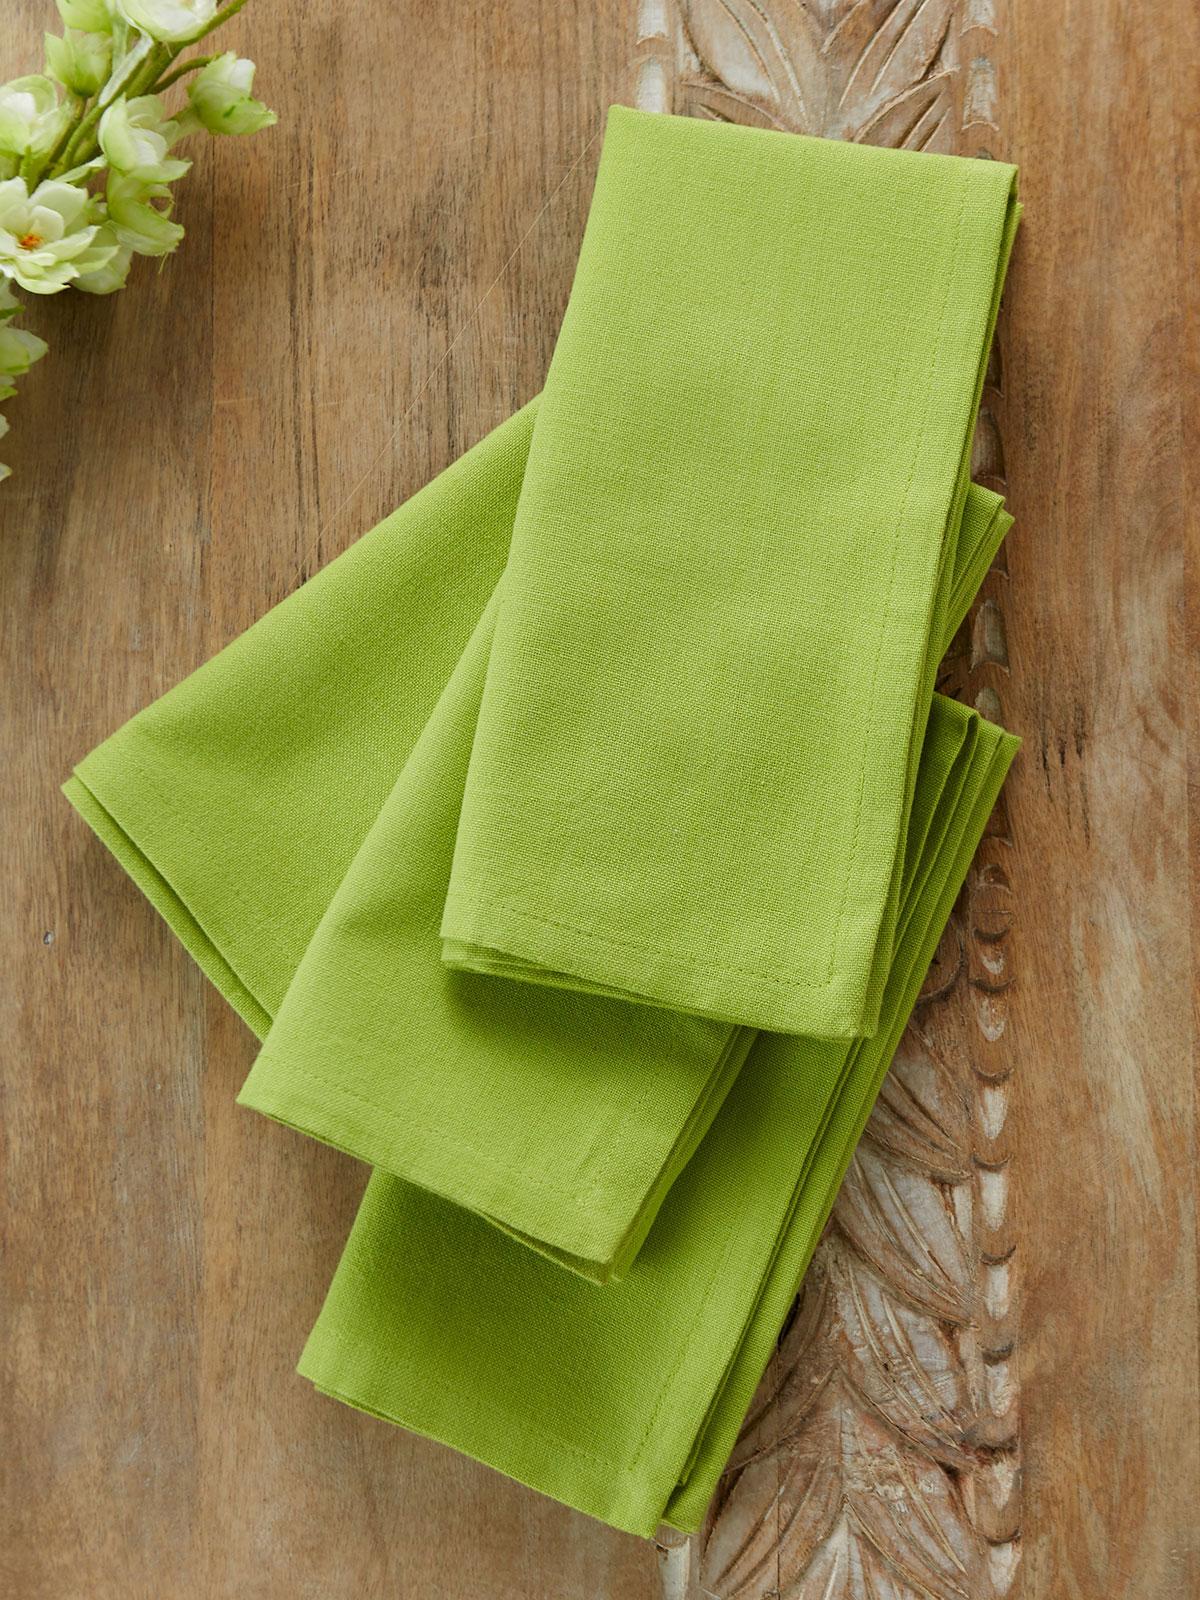 Hemmed Essential Napkin Set of 4 - Light Green